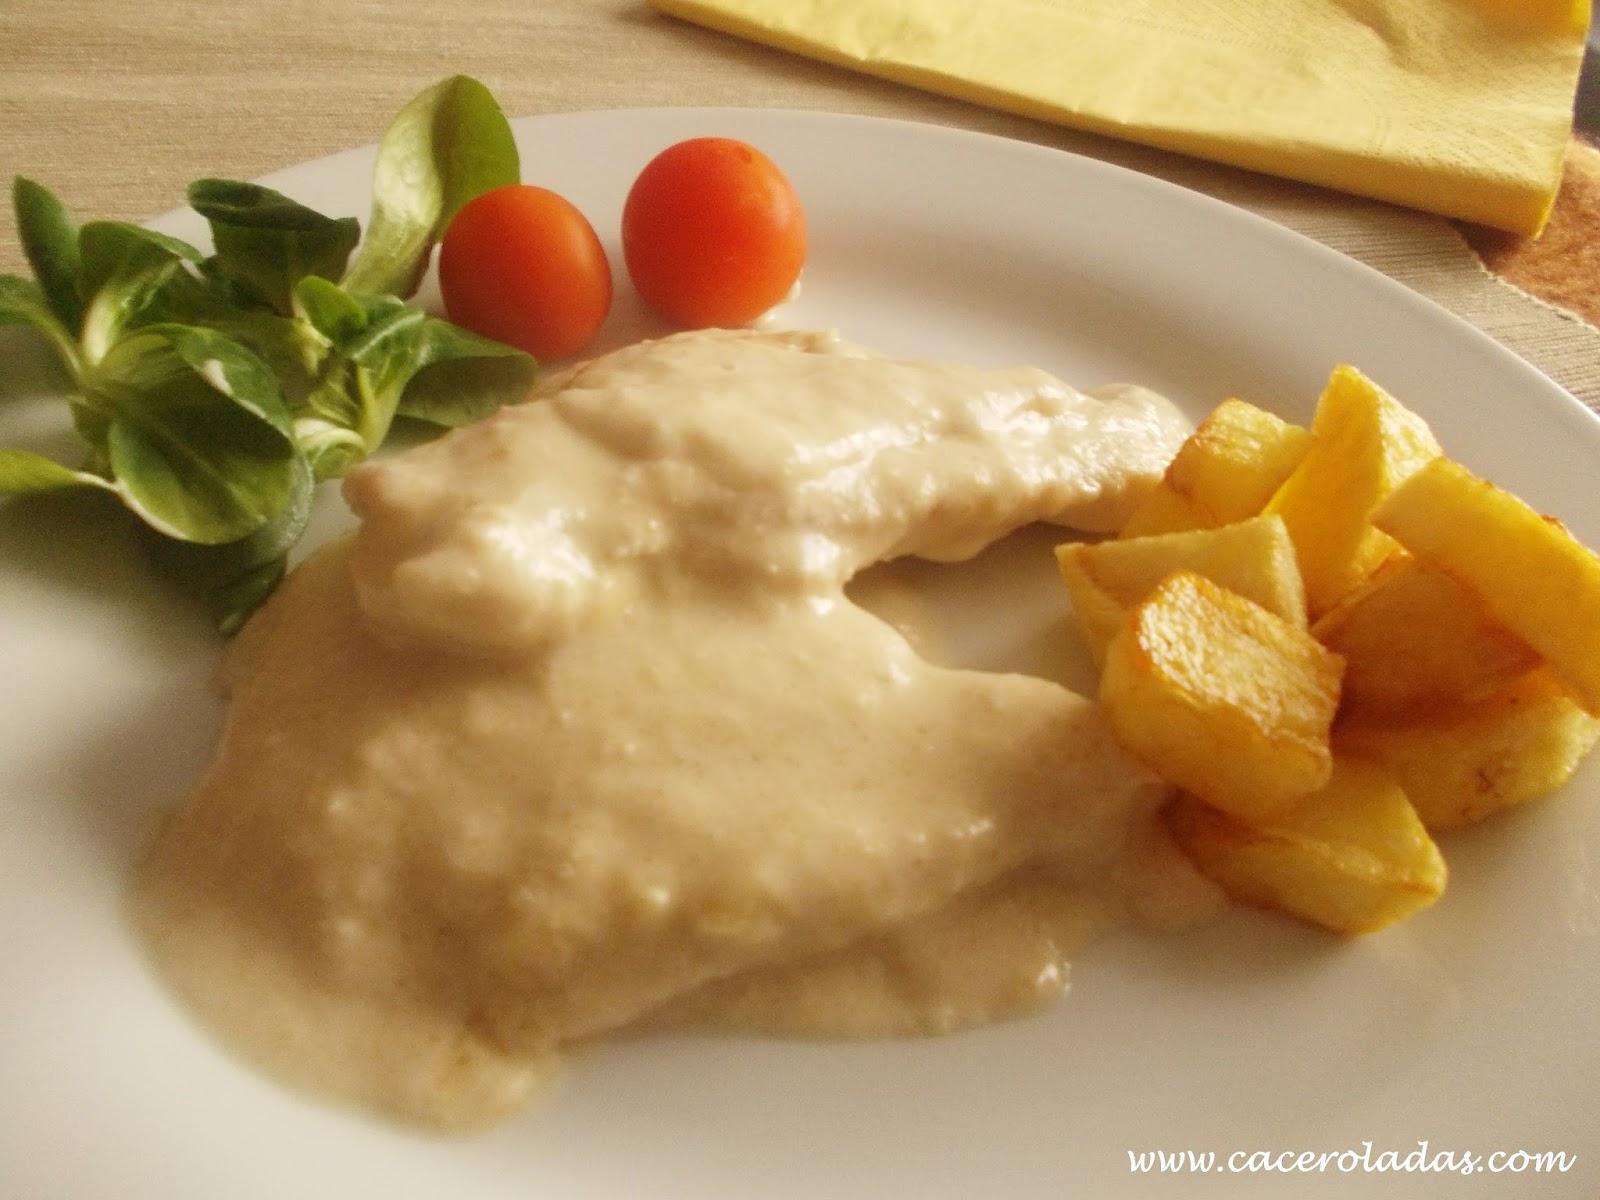 Filetes de pollo en salsa de almendras caceroladas - Filetes de carne en salsa ...